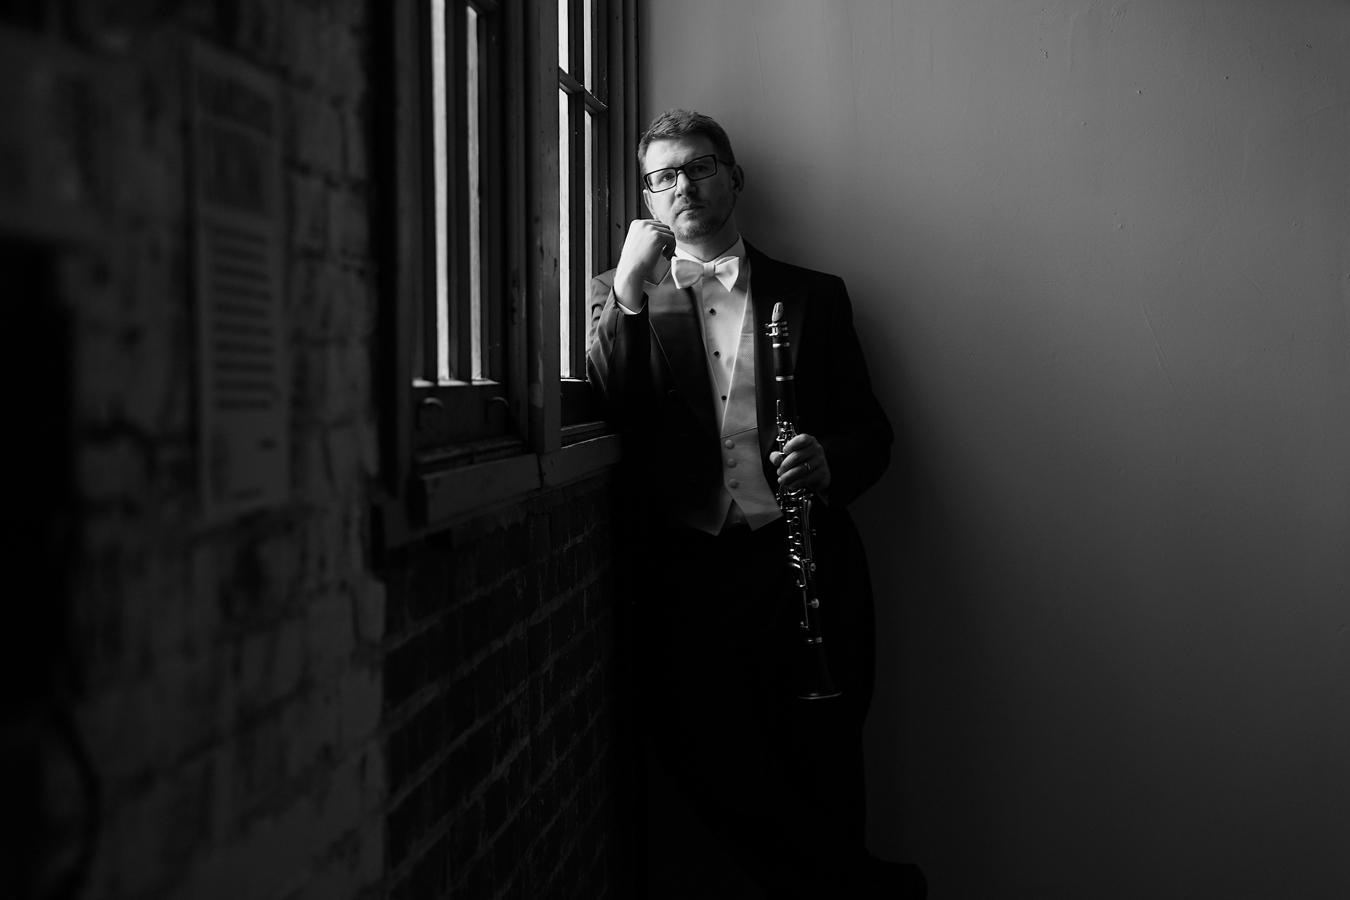 Matthew Nelson Clarinet by Tina Gutierrez 45Re